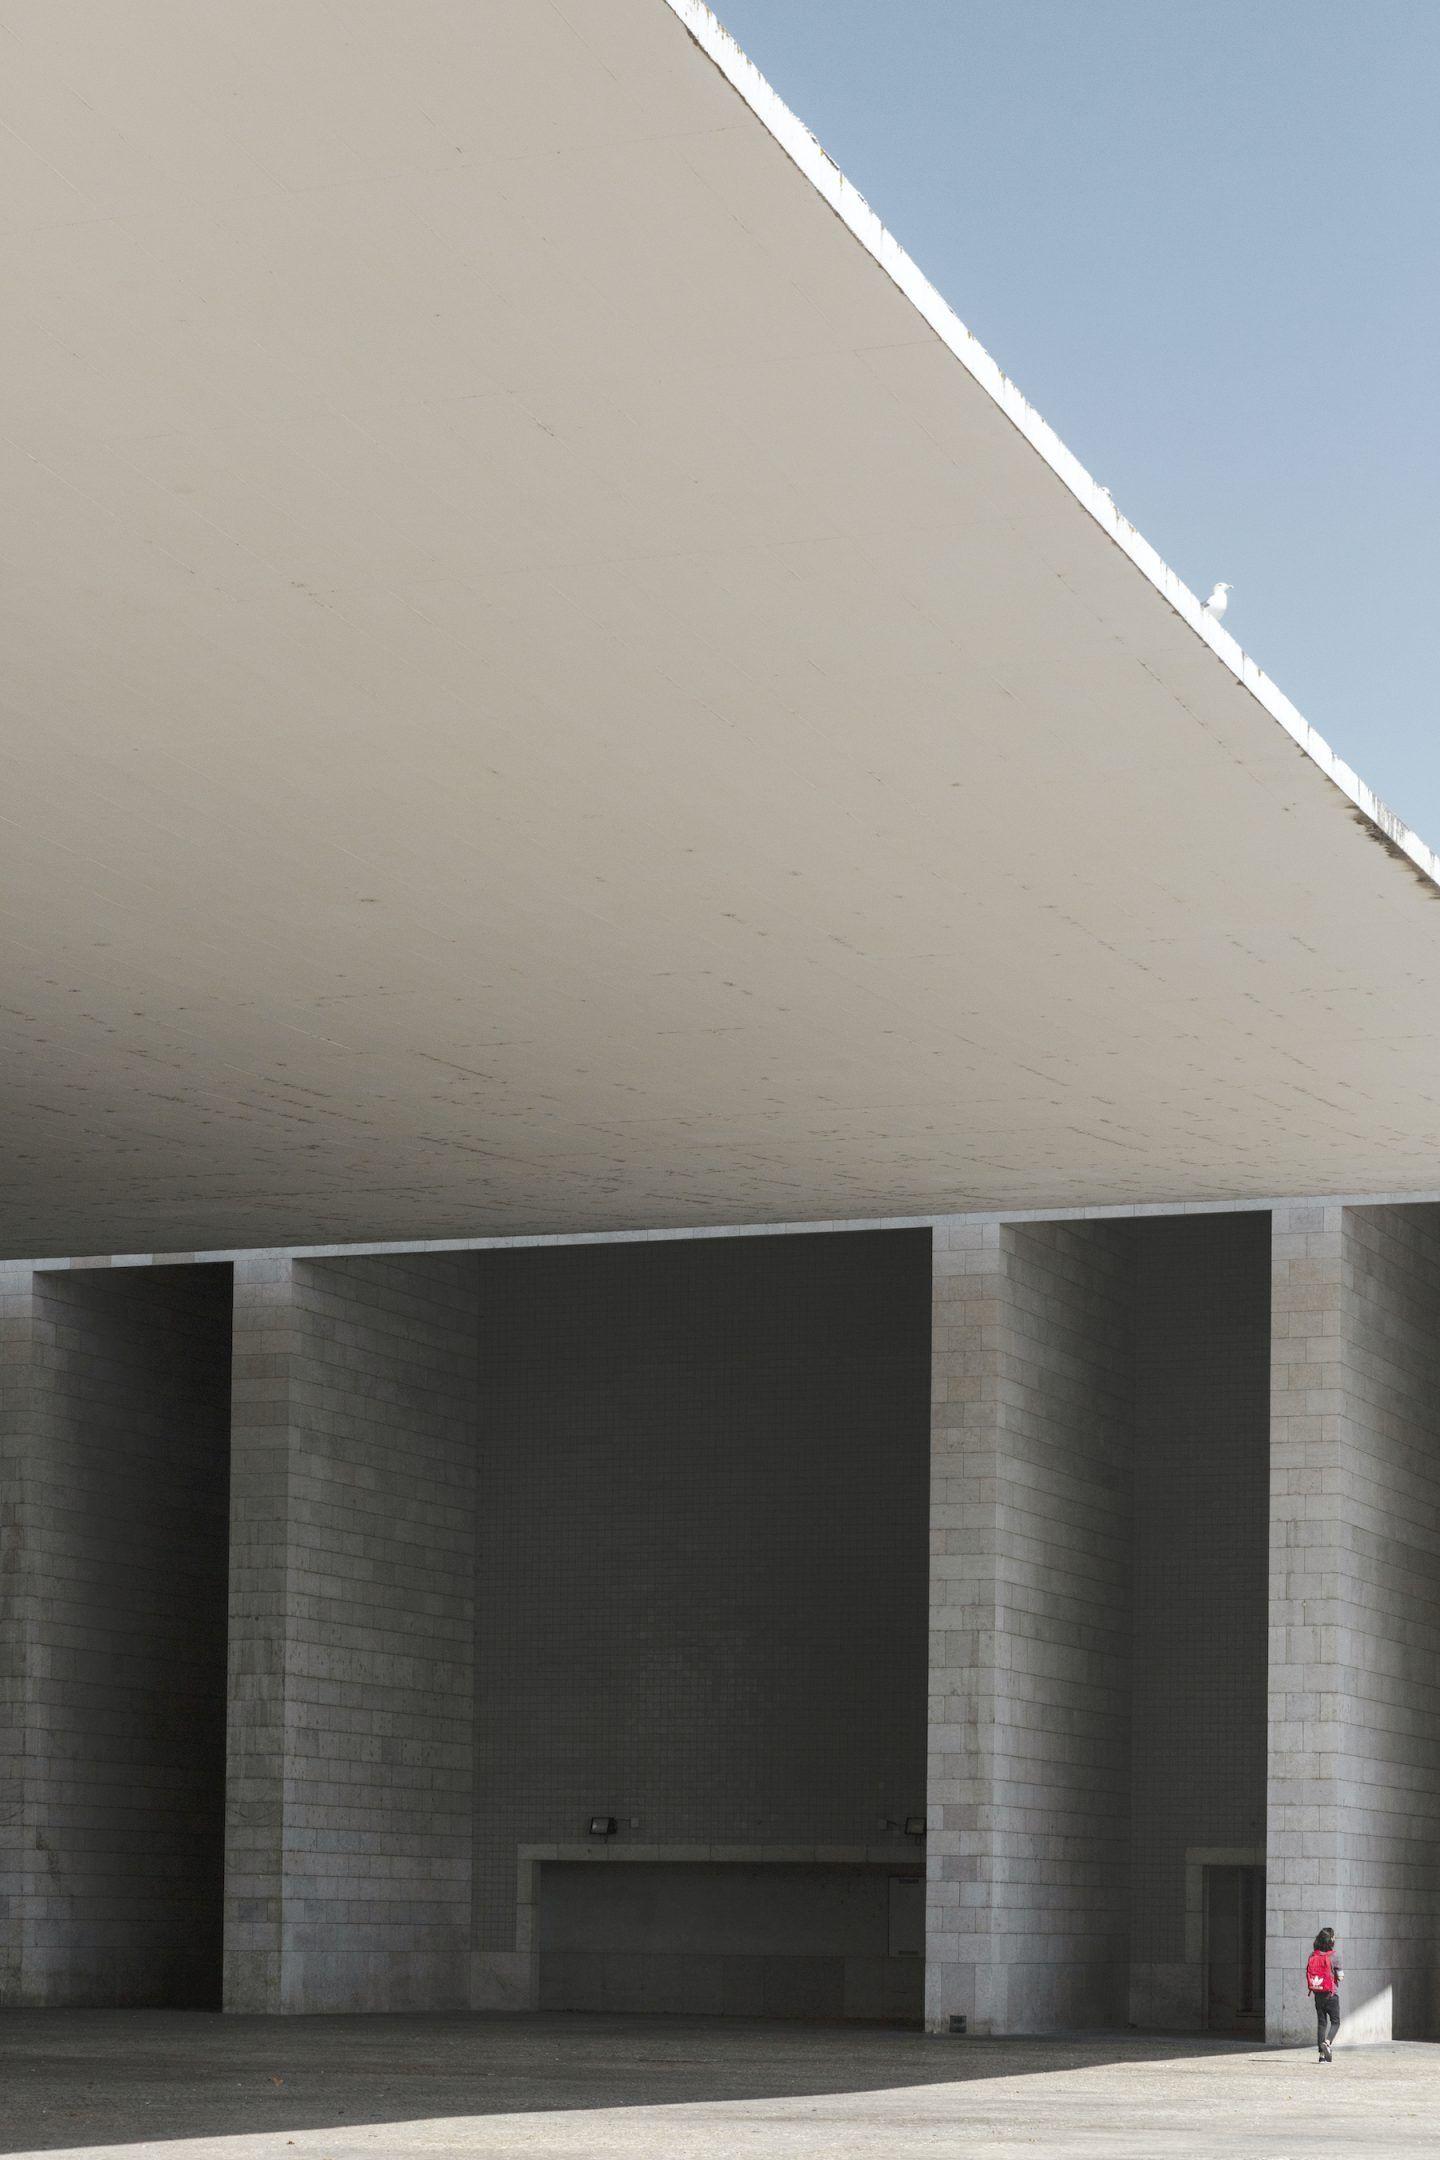 IGNANT-Architecture-Alvaro-Siza-Vieira-Portuguese-National-Pavilion-09